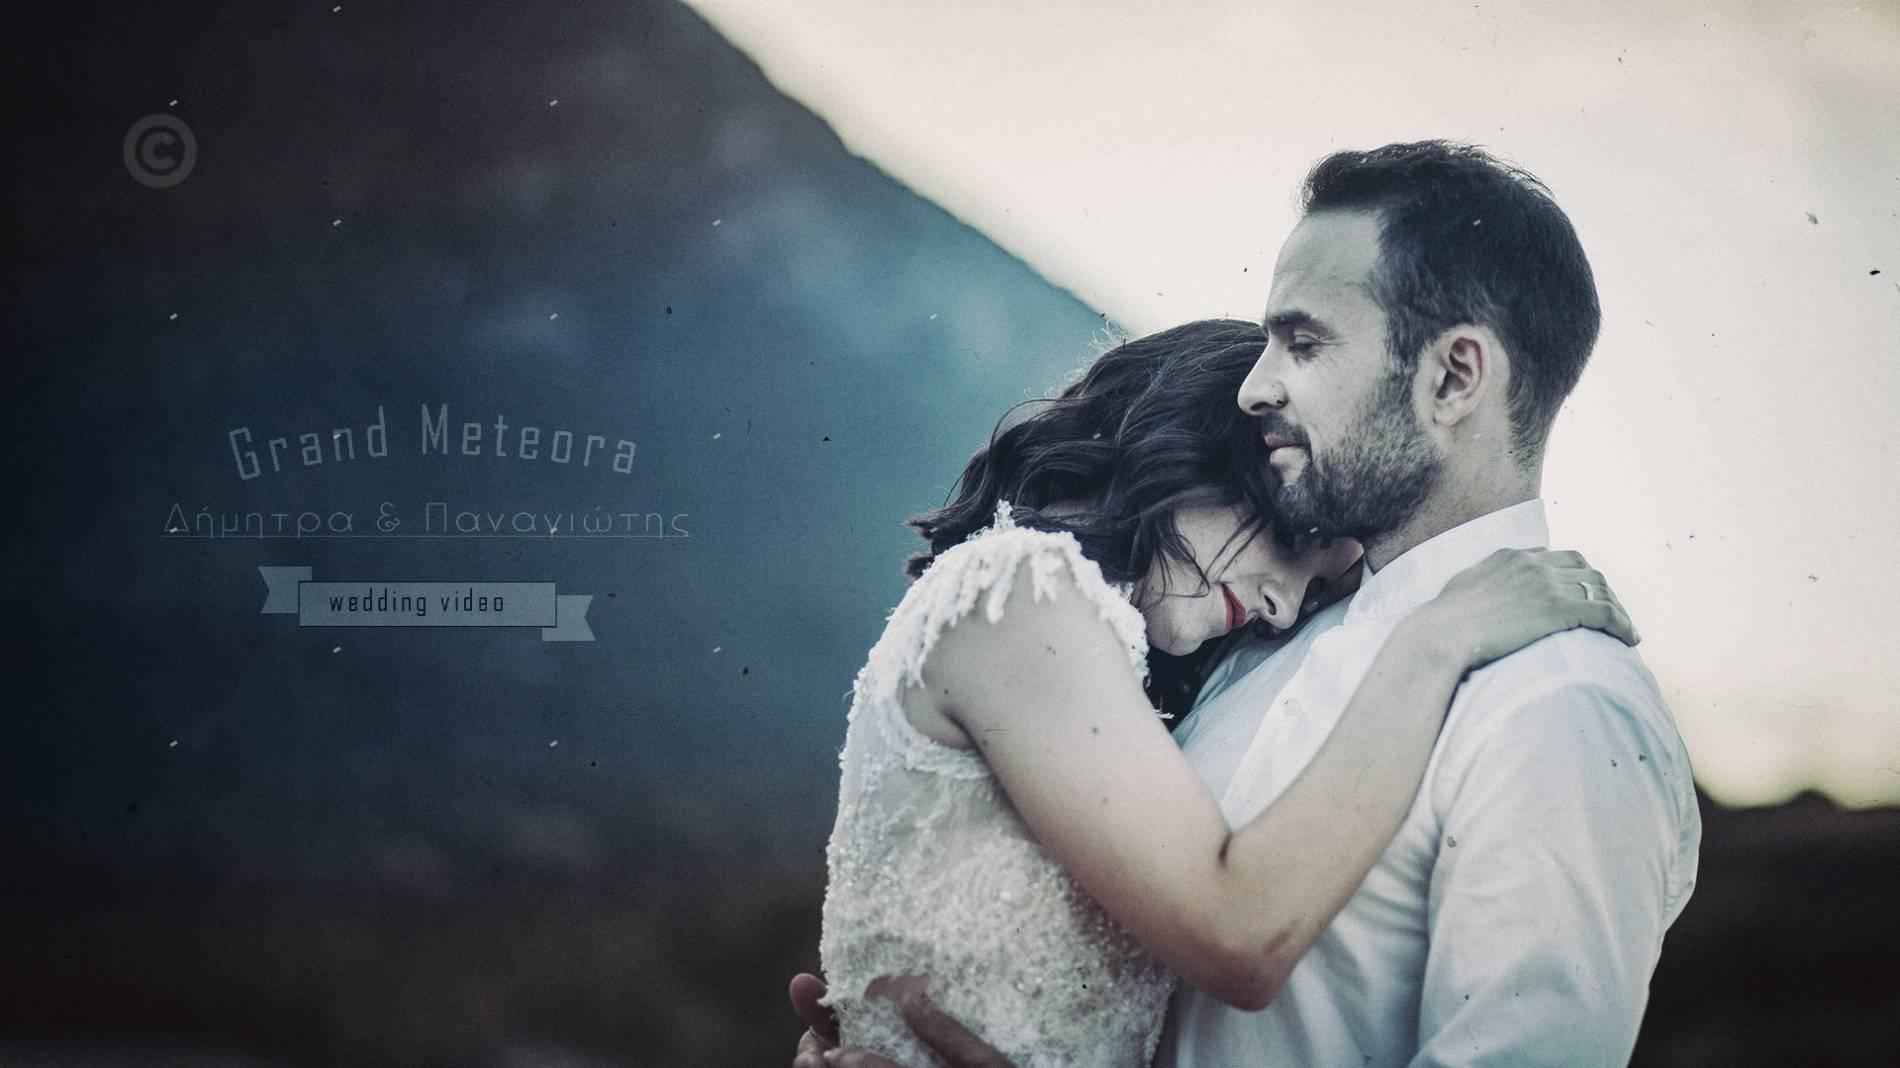 Grand Meteora wedding video